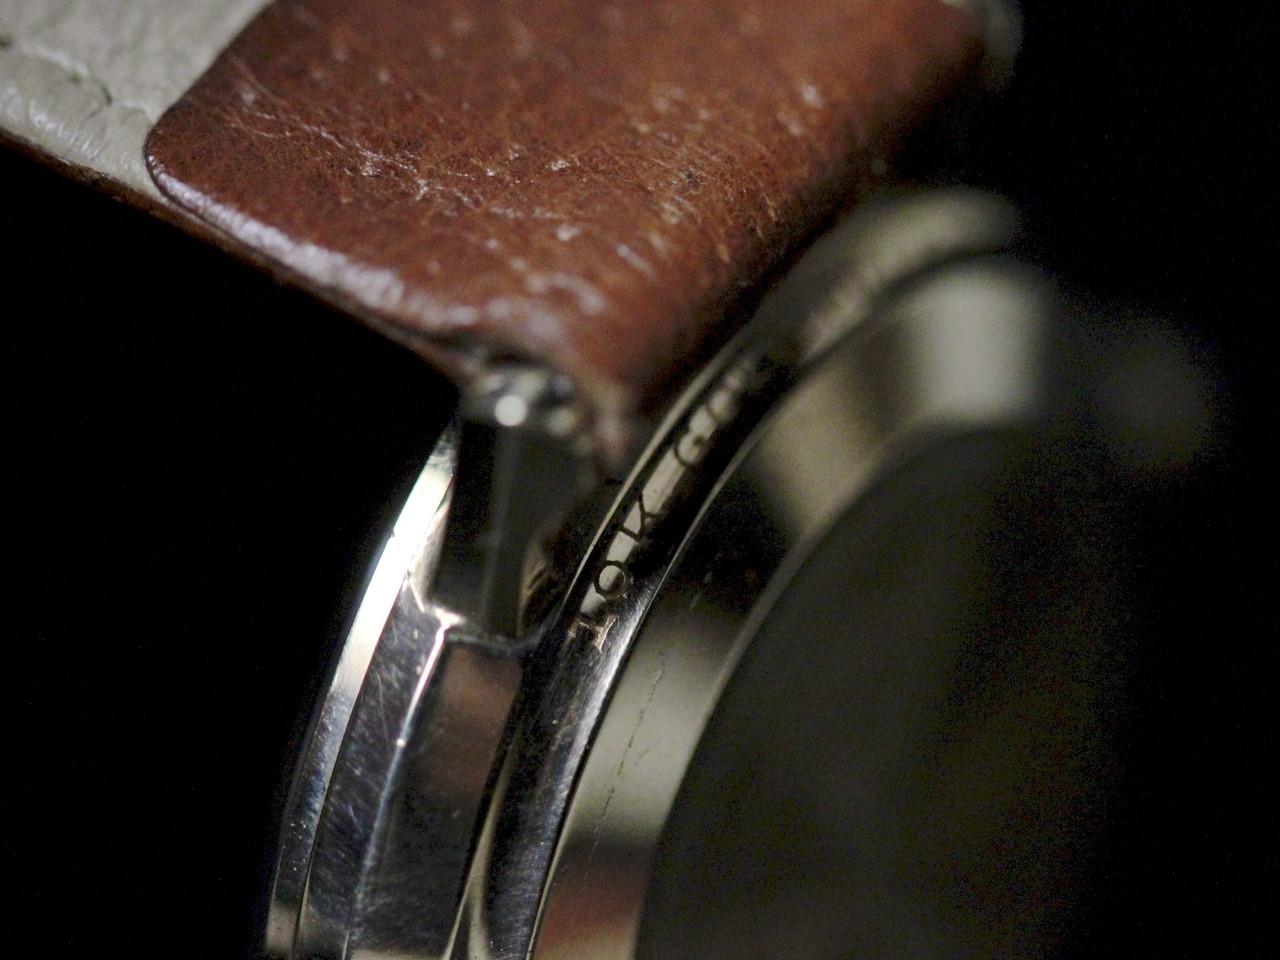 Vintage Longines Watch - Vintage Admiral Complete - www.Legendoftime.com - Chicago Watch Center